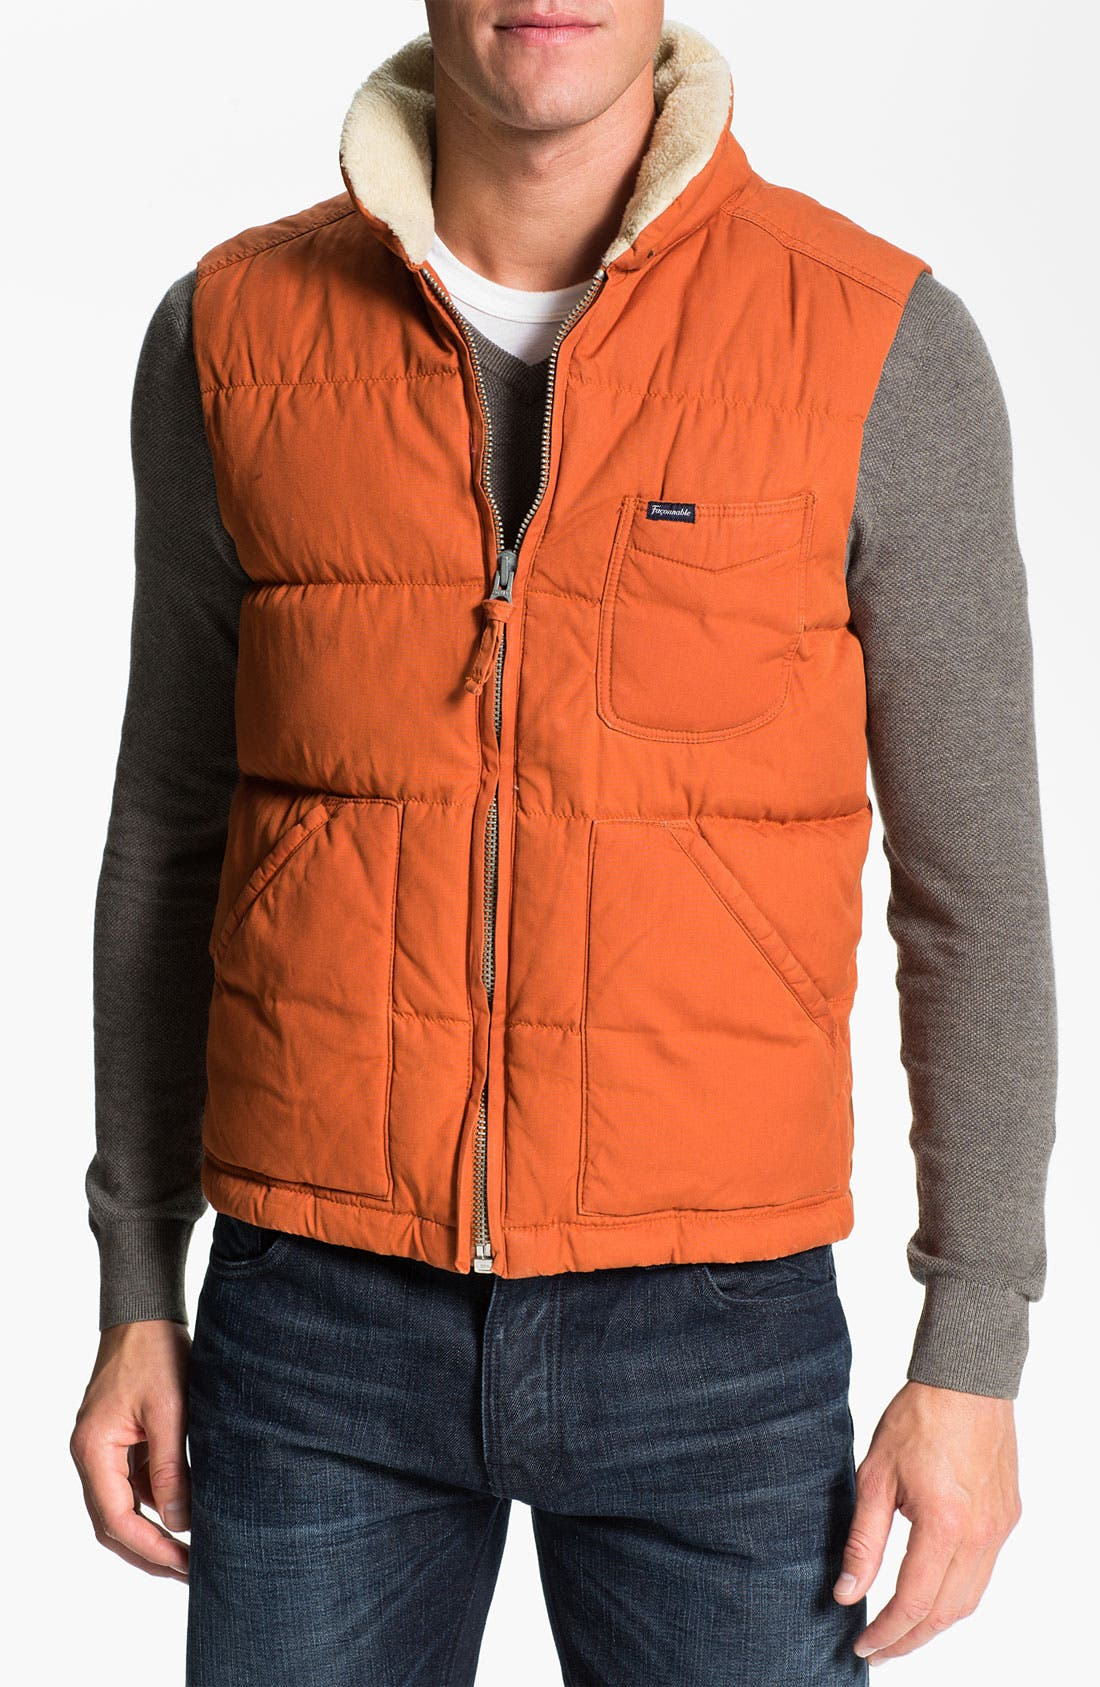 Alternate Image 1 Selected - Façonnable 'Cire' Club Fit Down & Feather Vest with Faux Fur Trim